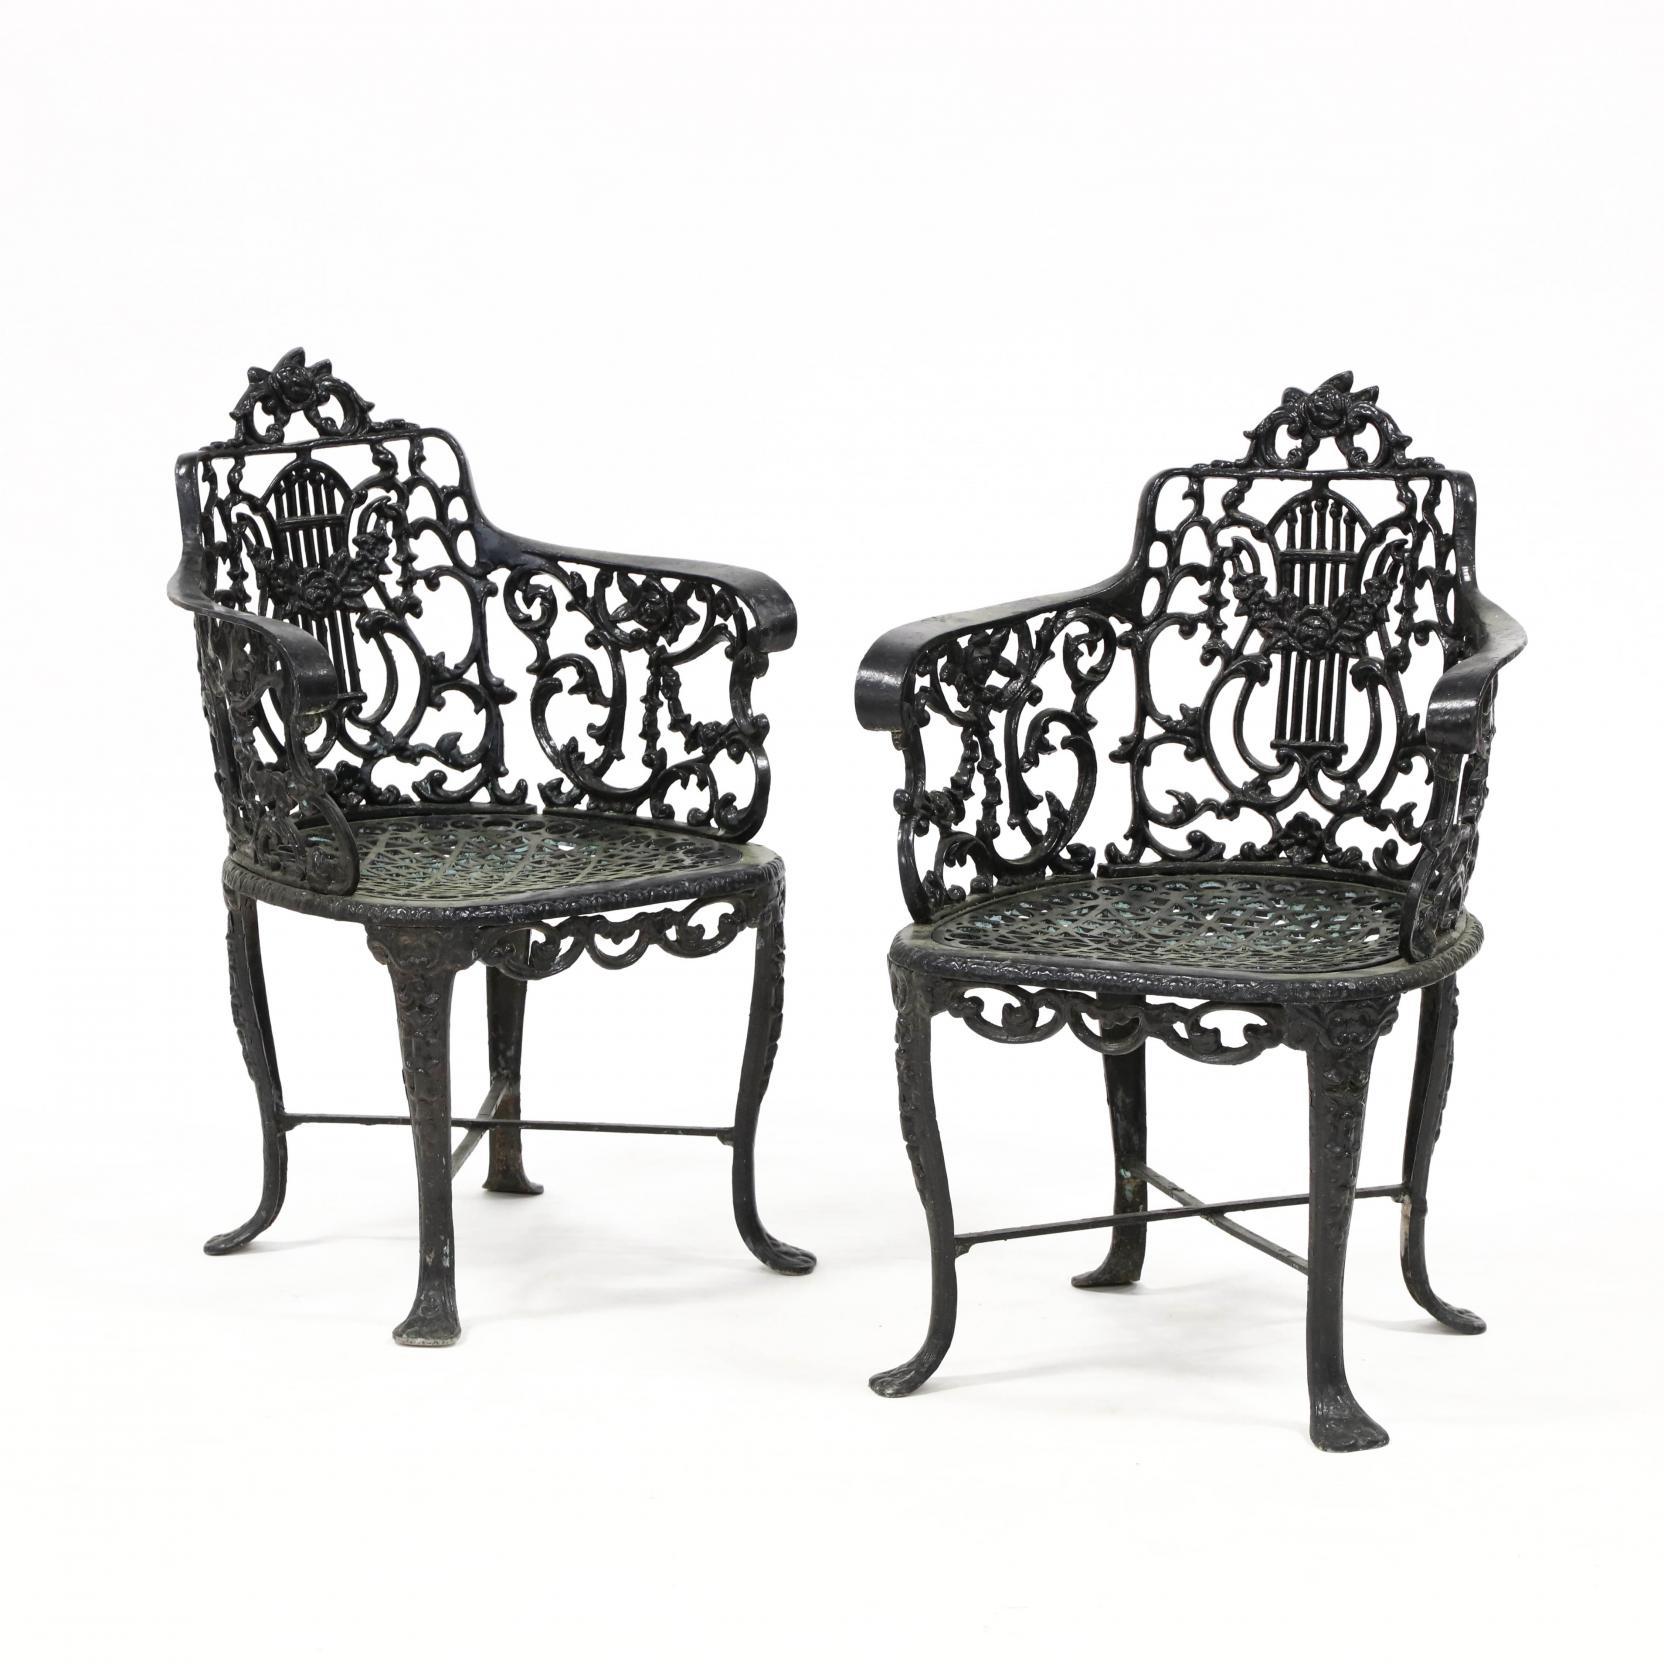 pair-of-vintage-cast-aluminum-garden-chairs